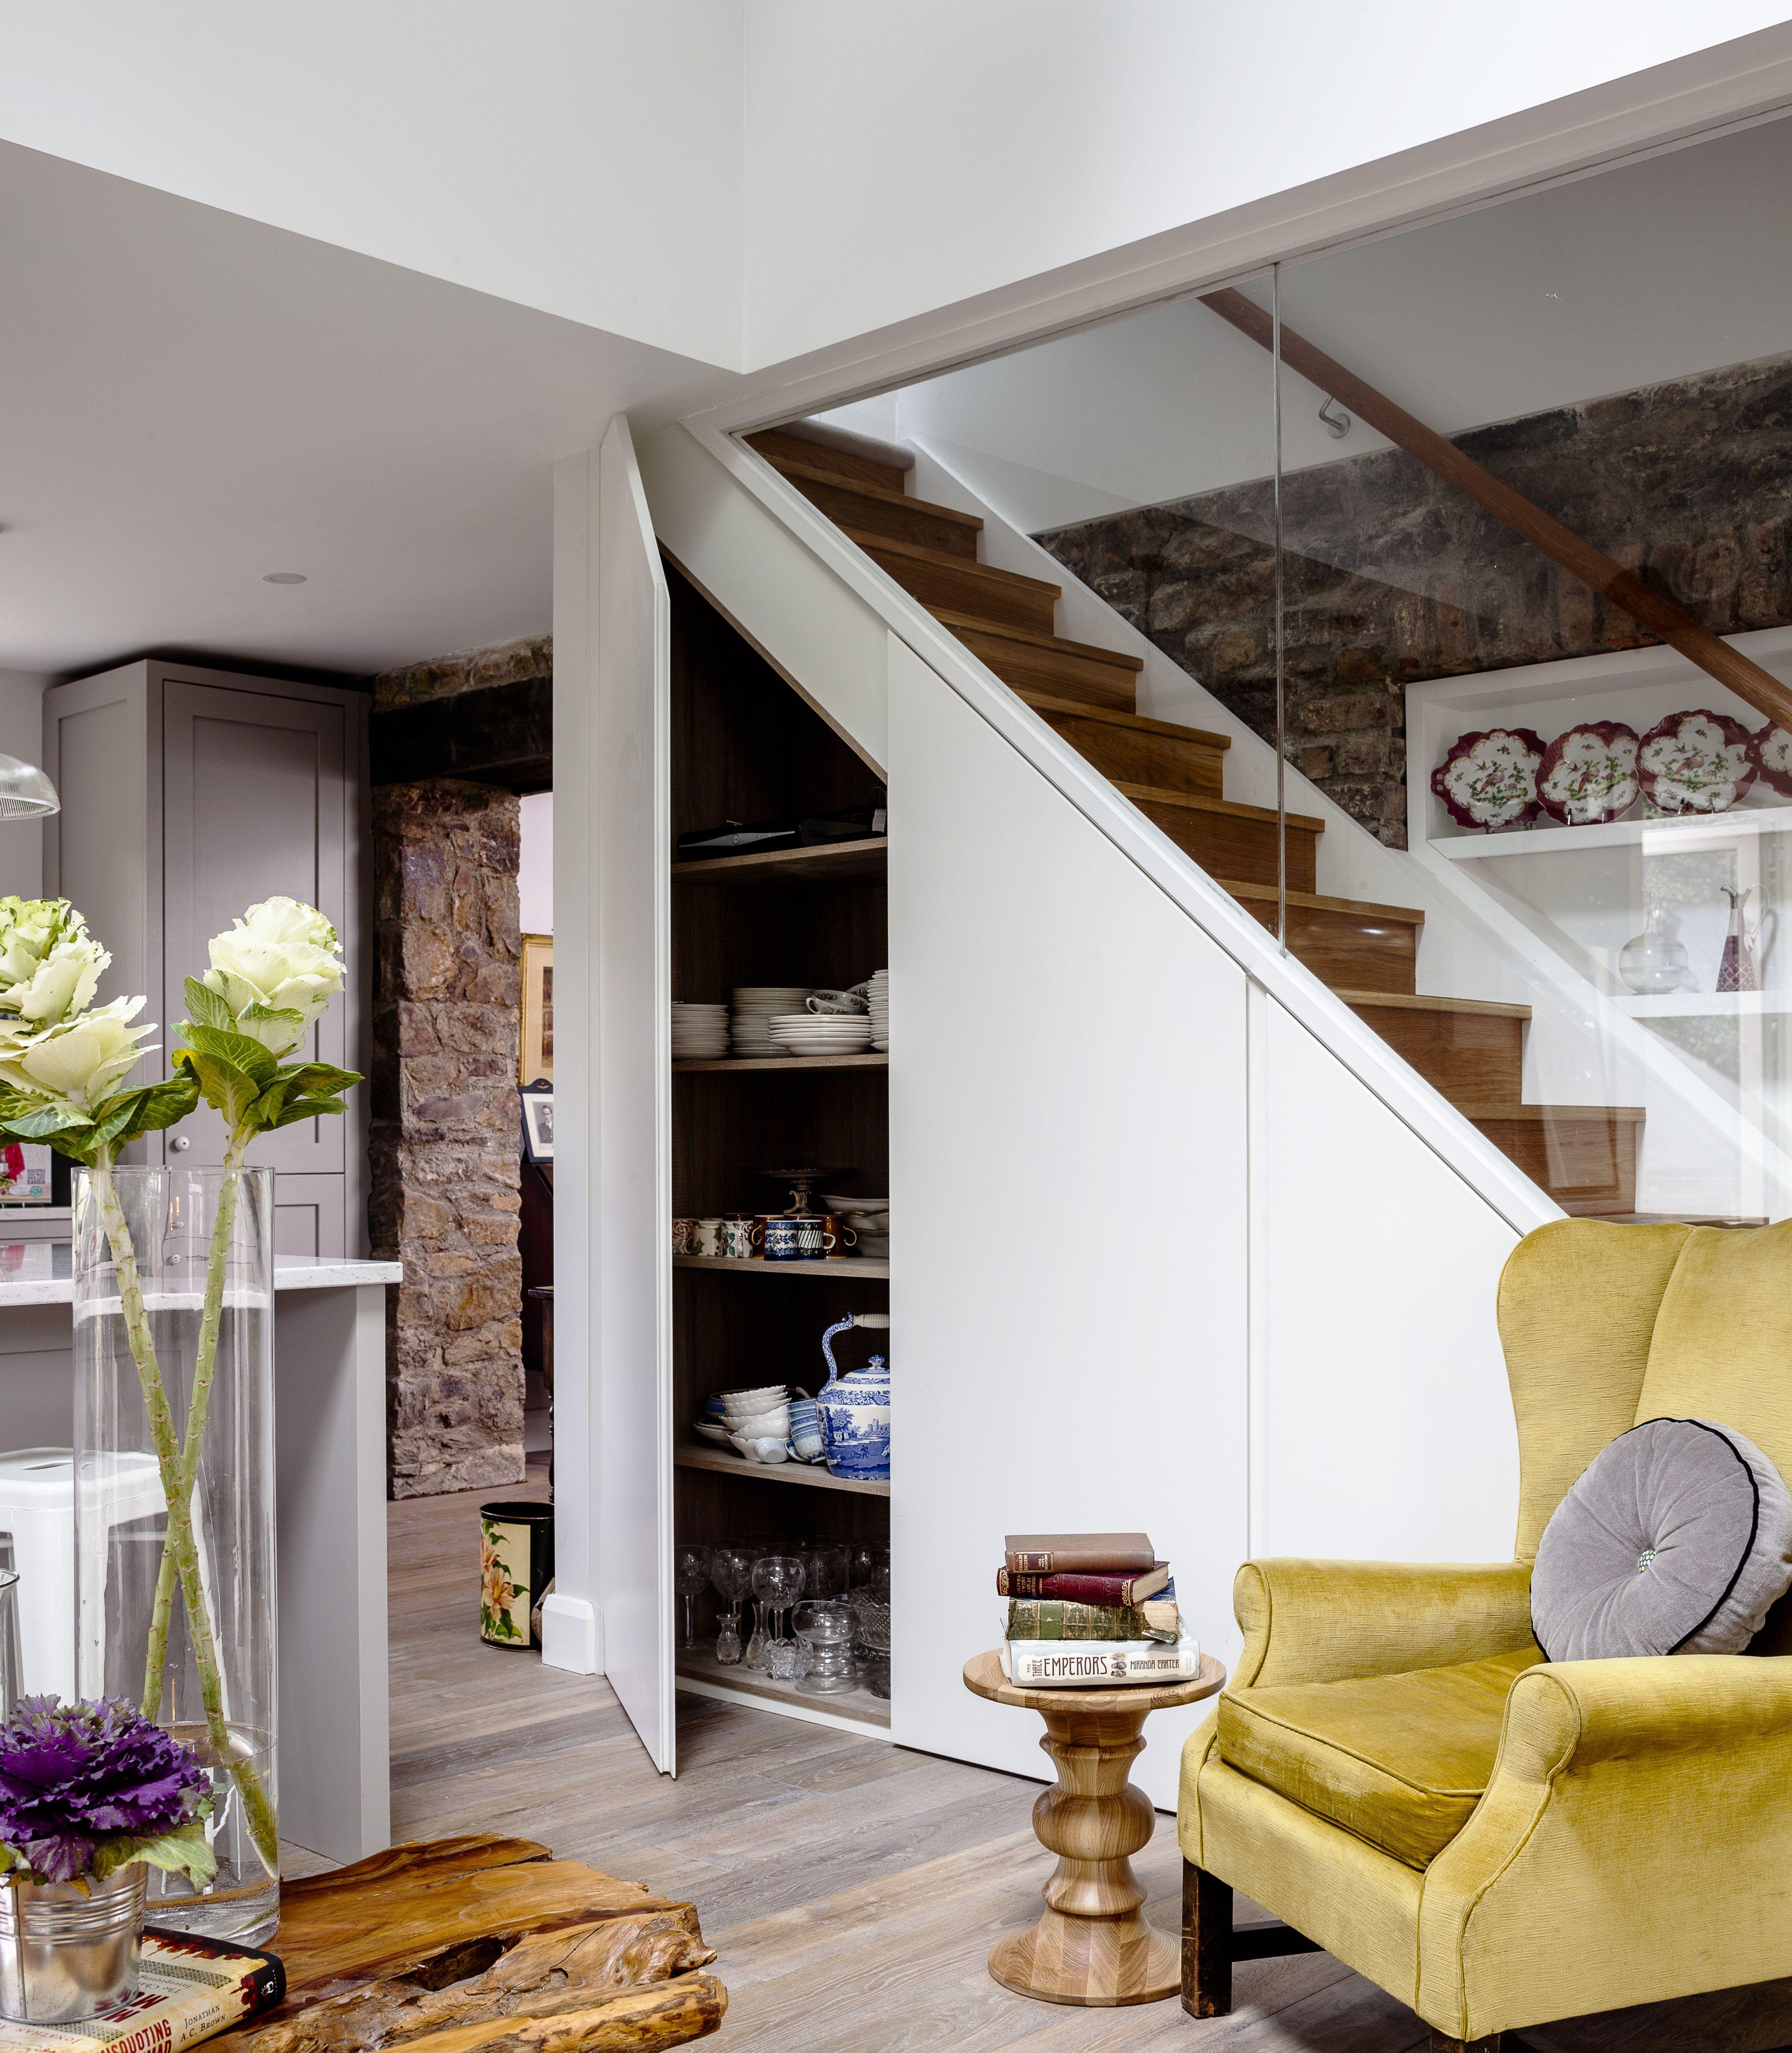 Bespoke Under Stairs Shelving: Bespoke Stairs Design With Understair Storage. Glass